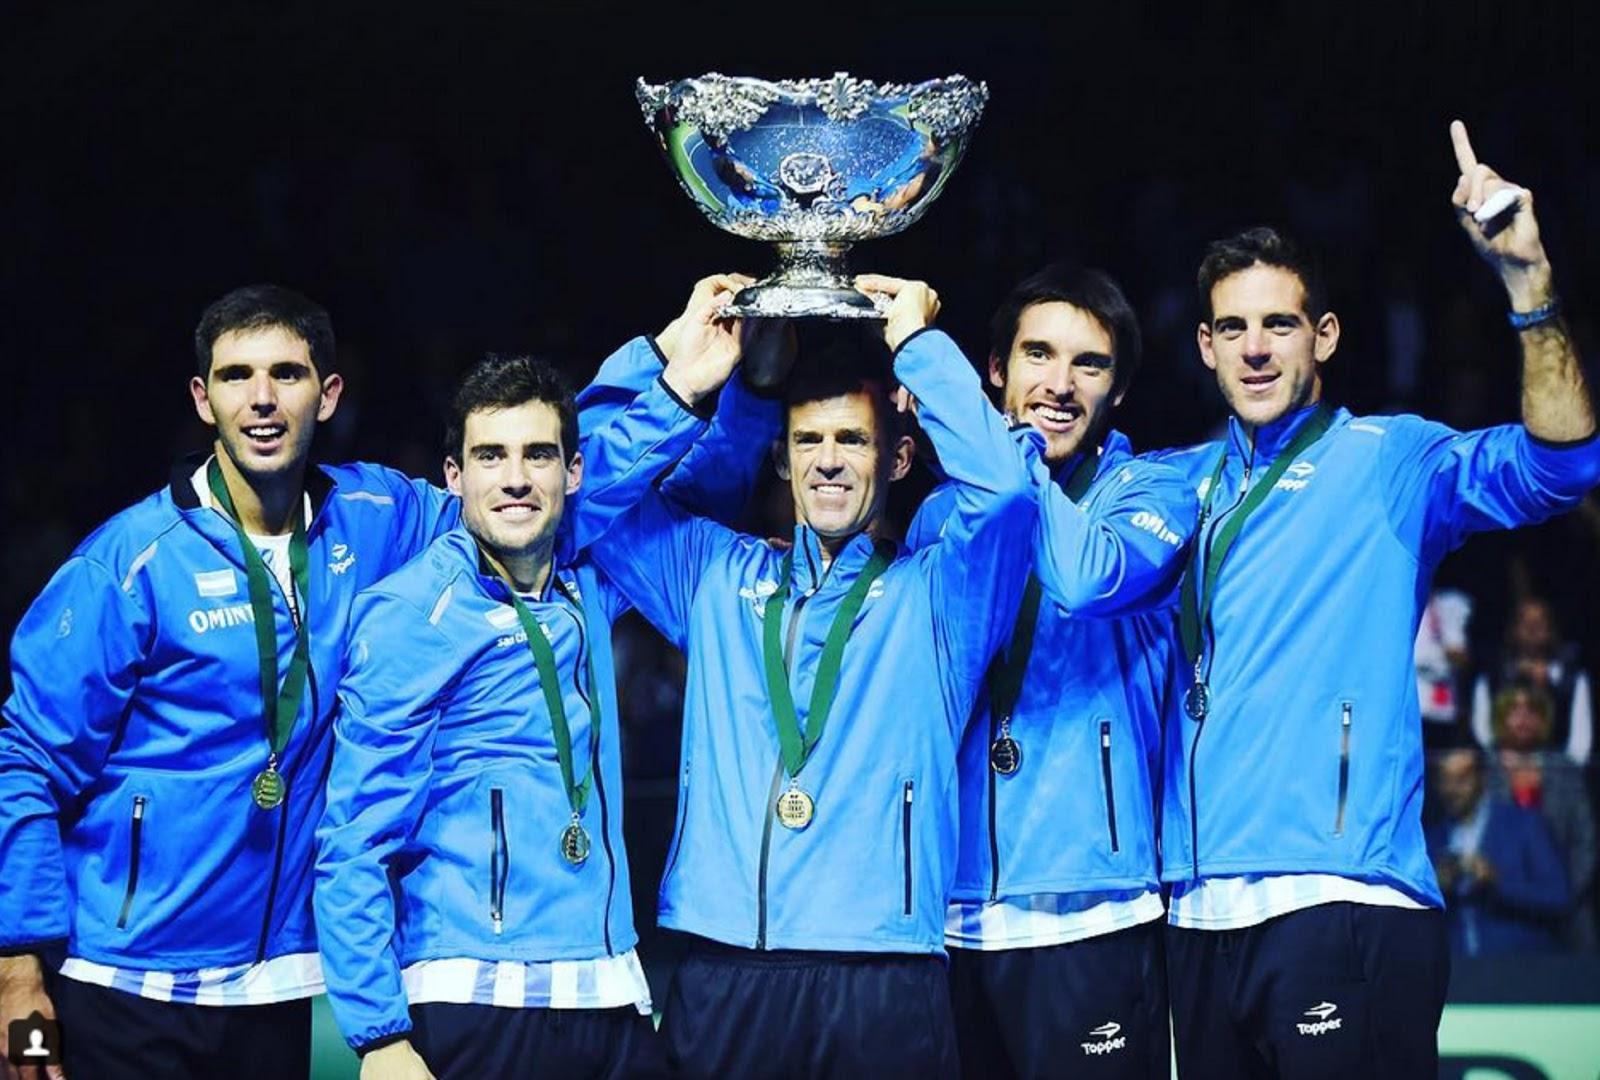 ARGENTINA DAVIS CUP CHAMPIONS 10